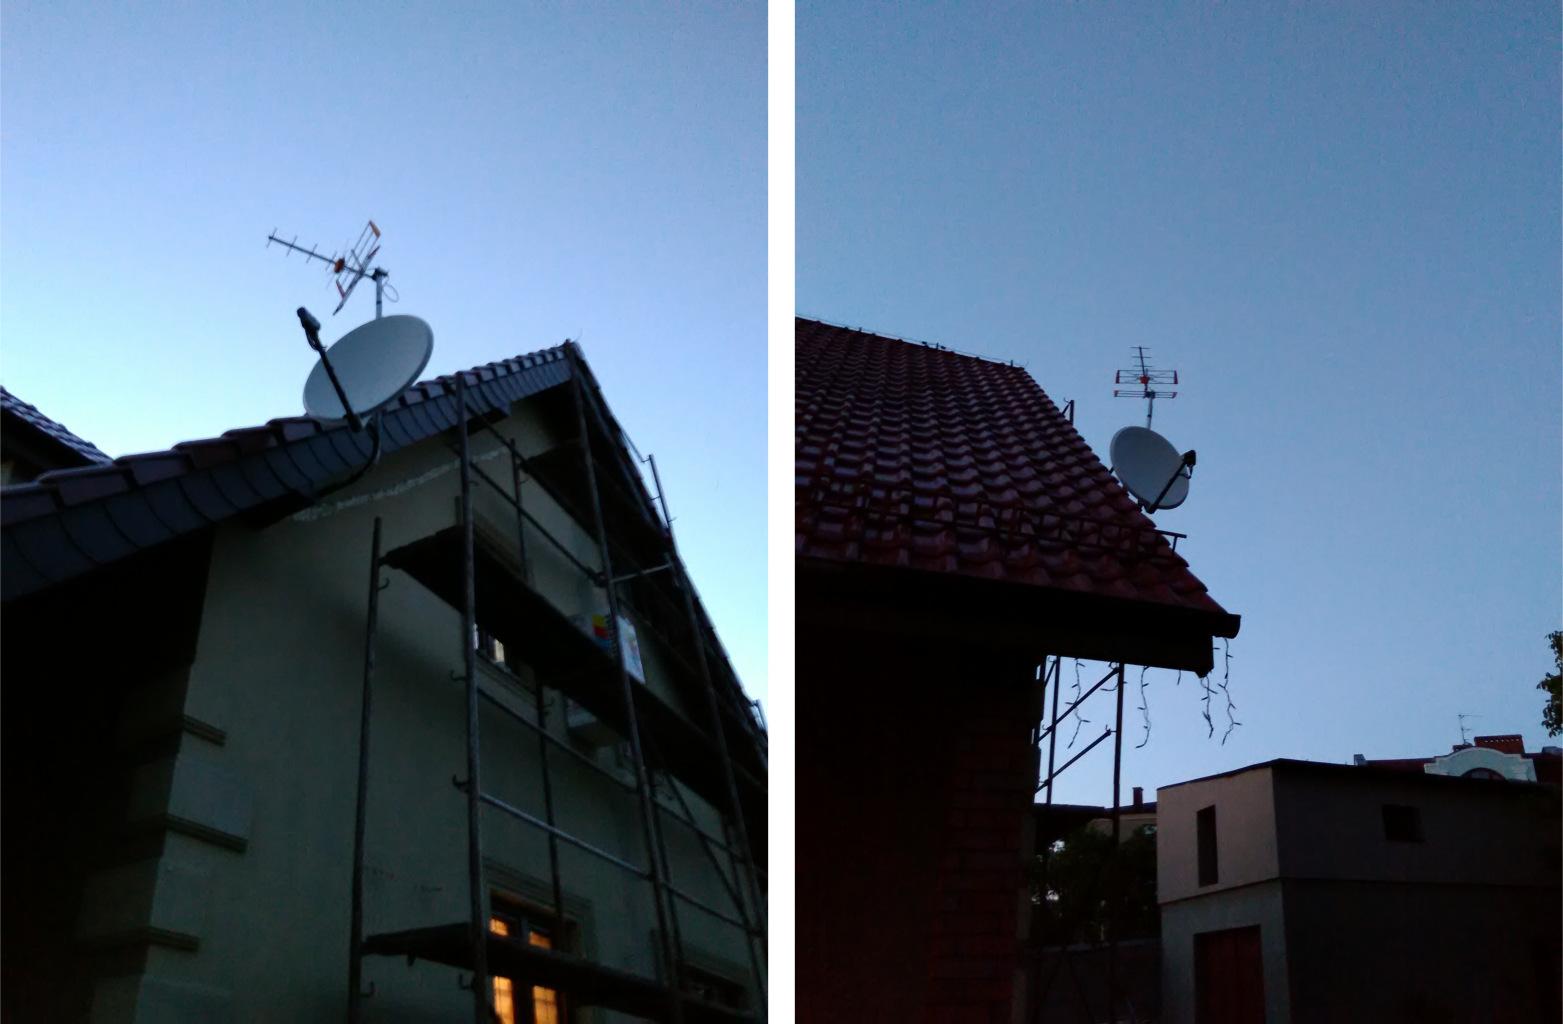 montaż-anten-tv-sat-kłobuck